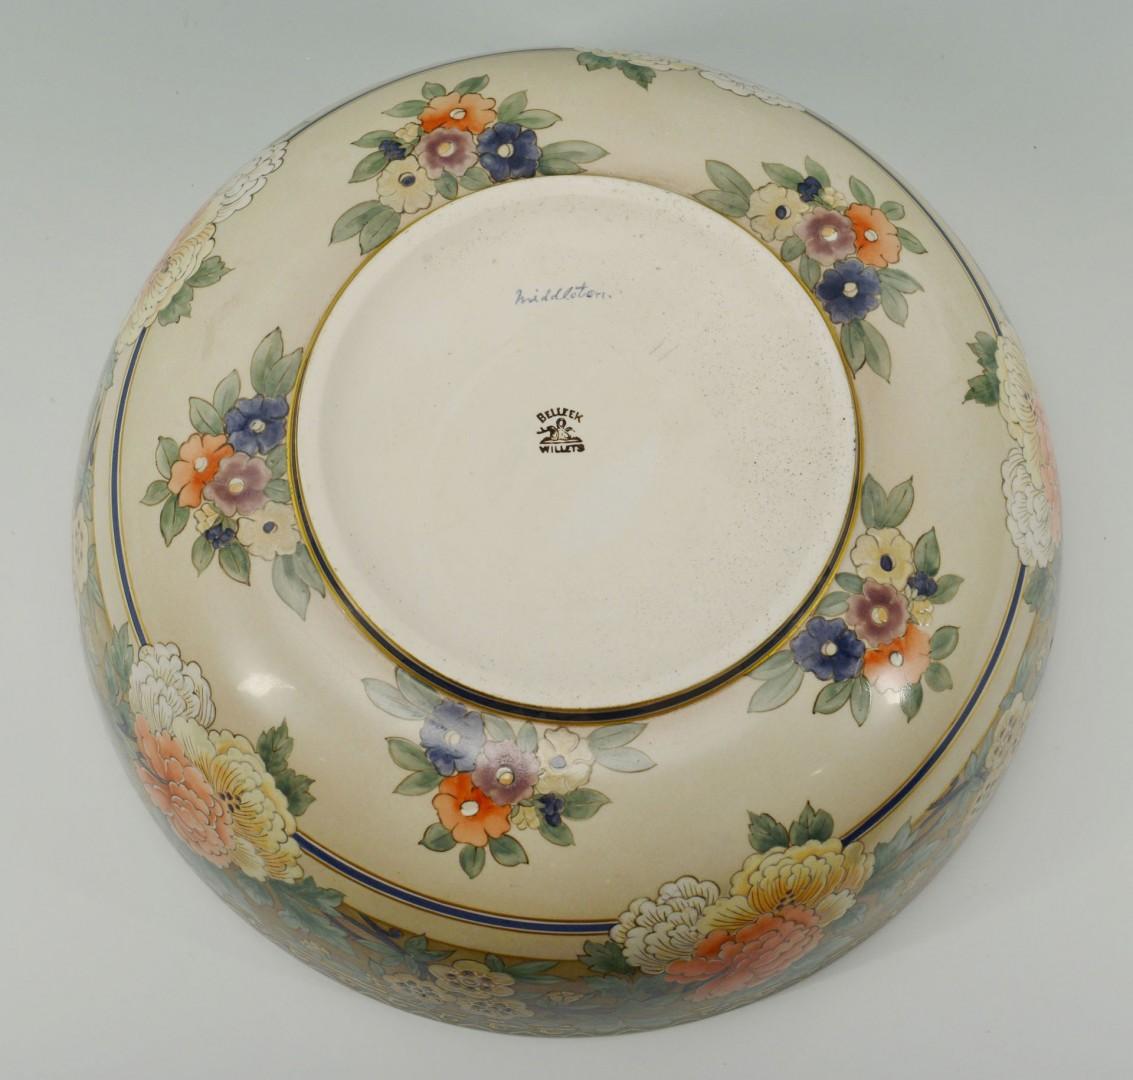 Willets Belleek Bowl